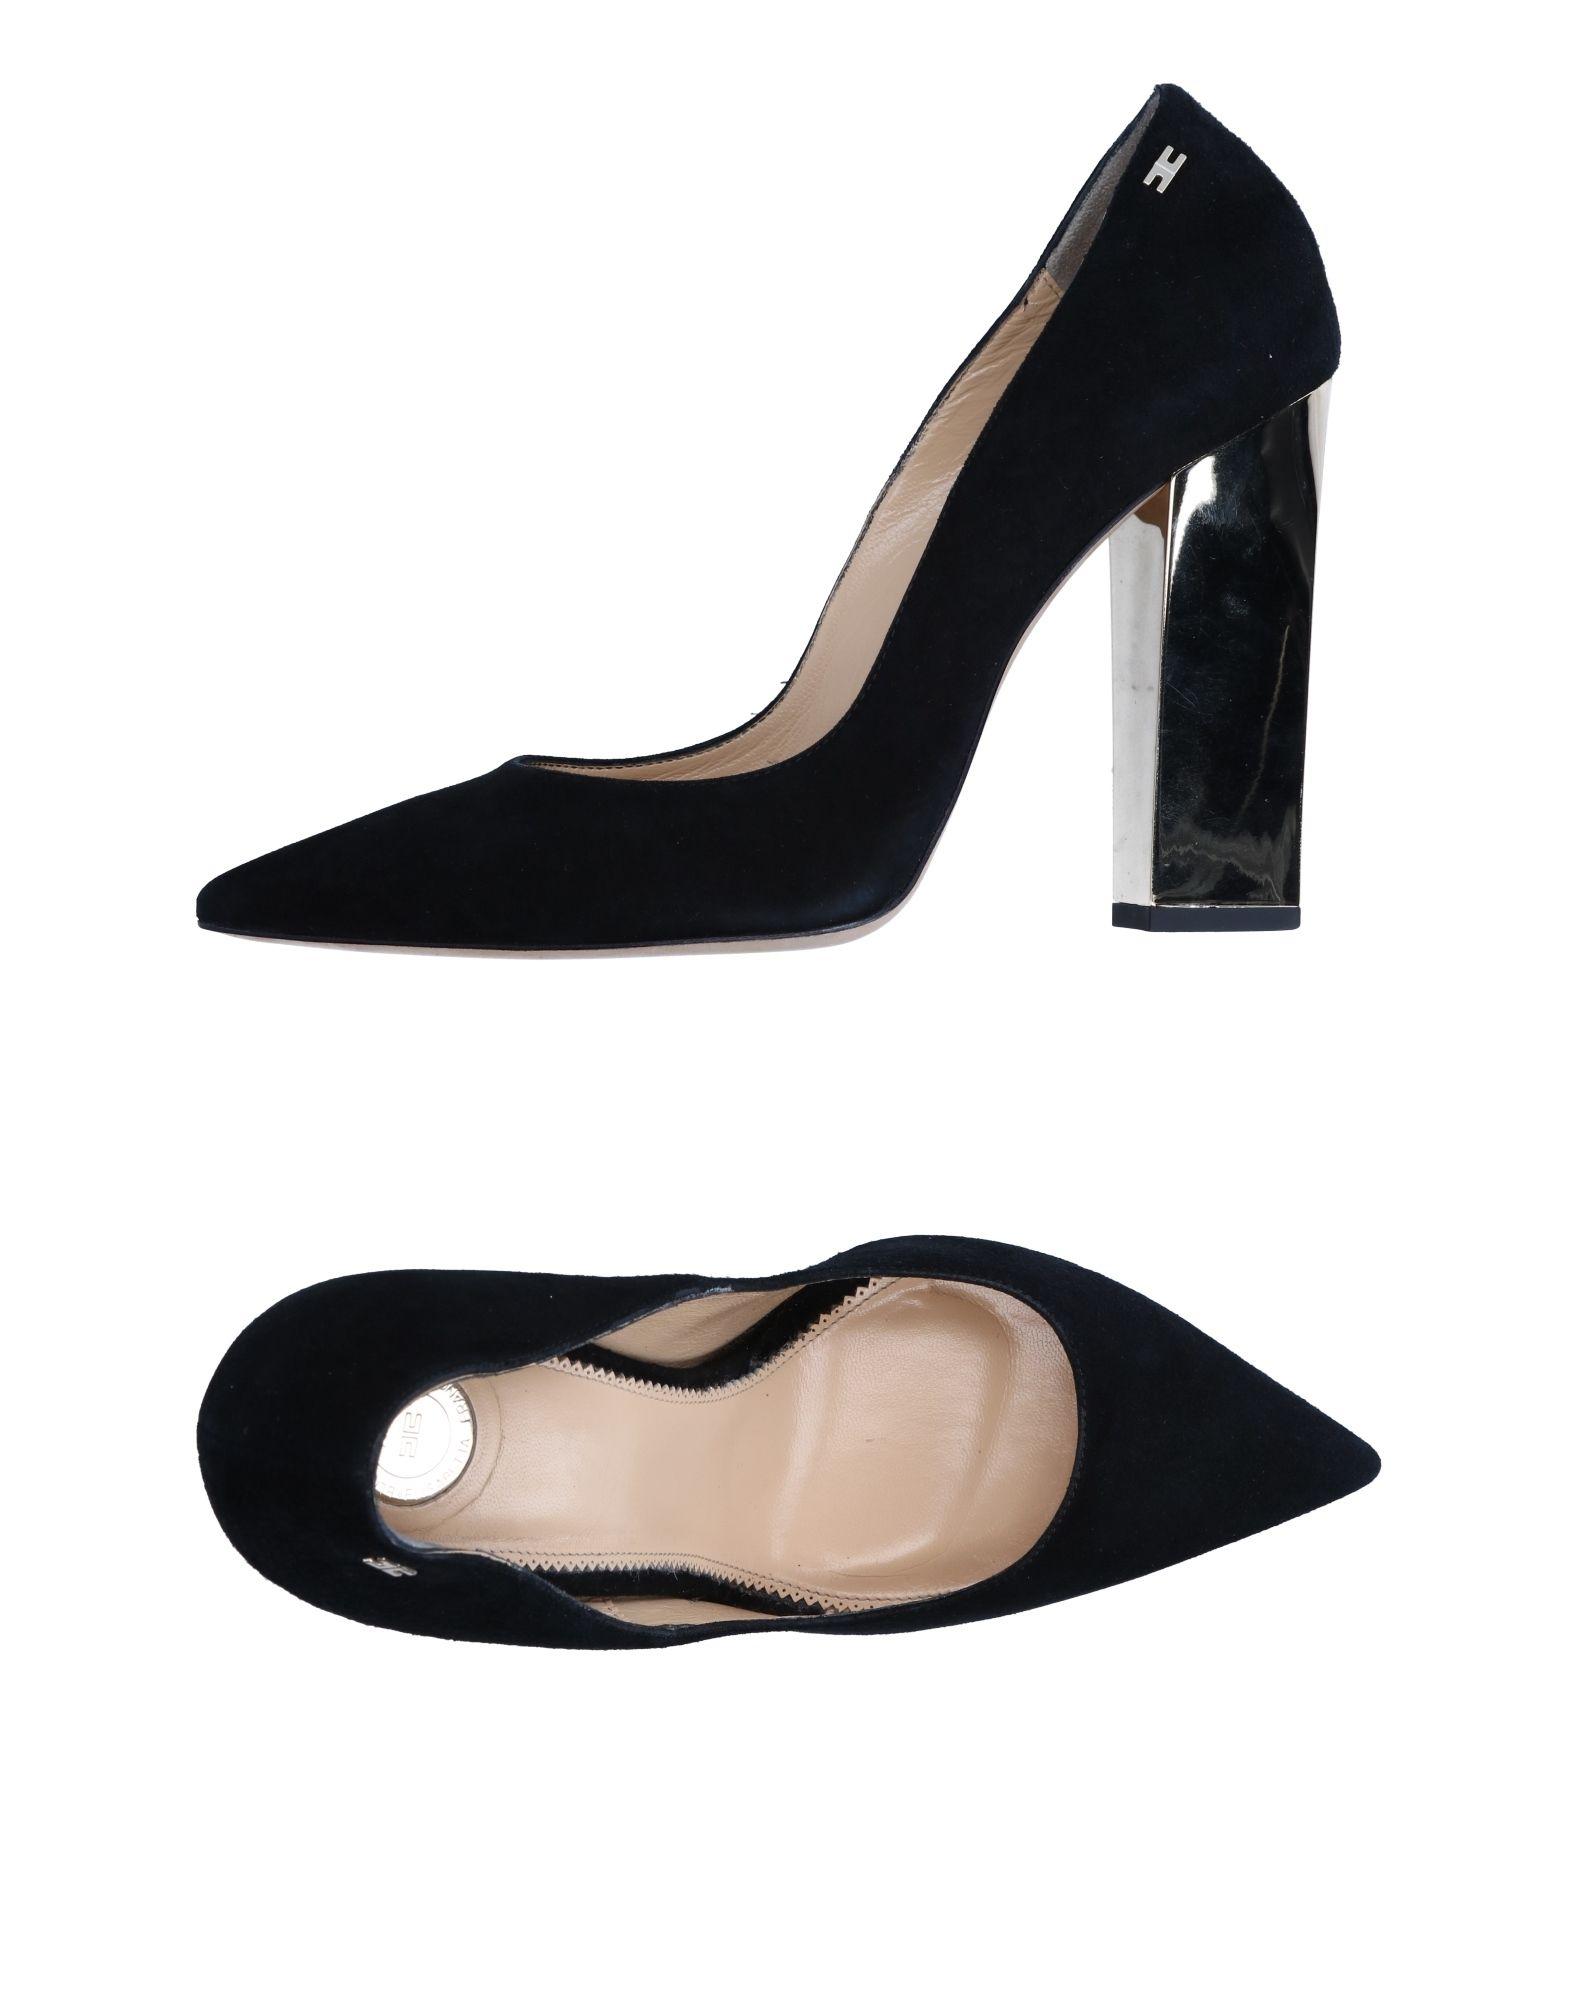 Elisabetta Franchi Neue Pumps Damen  11277297LL Neue Franchi Schuhe ded09a